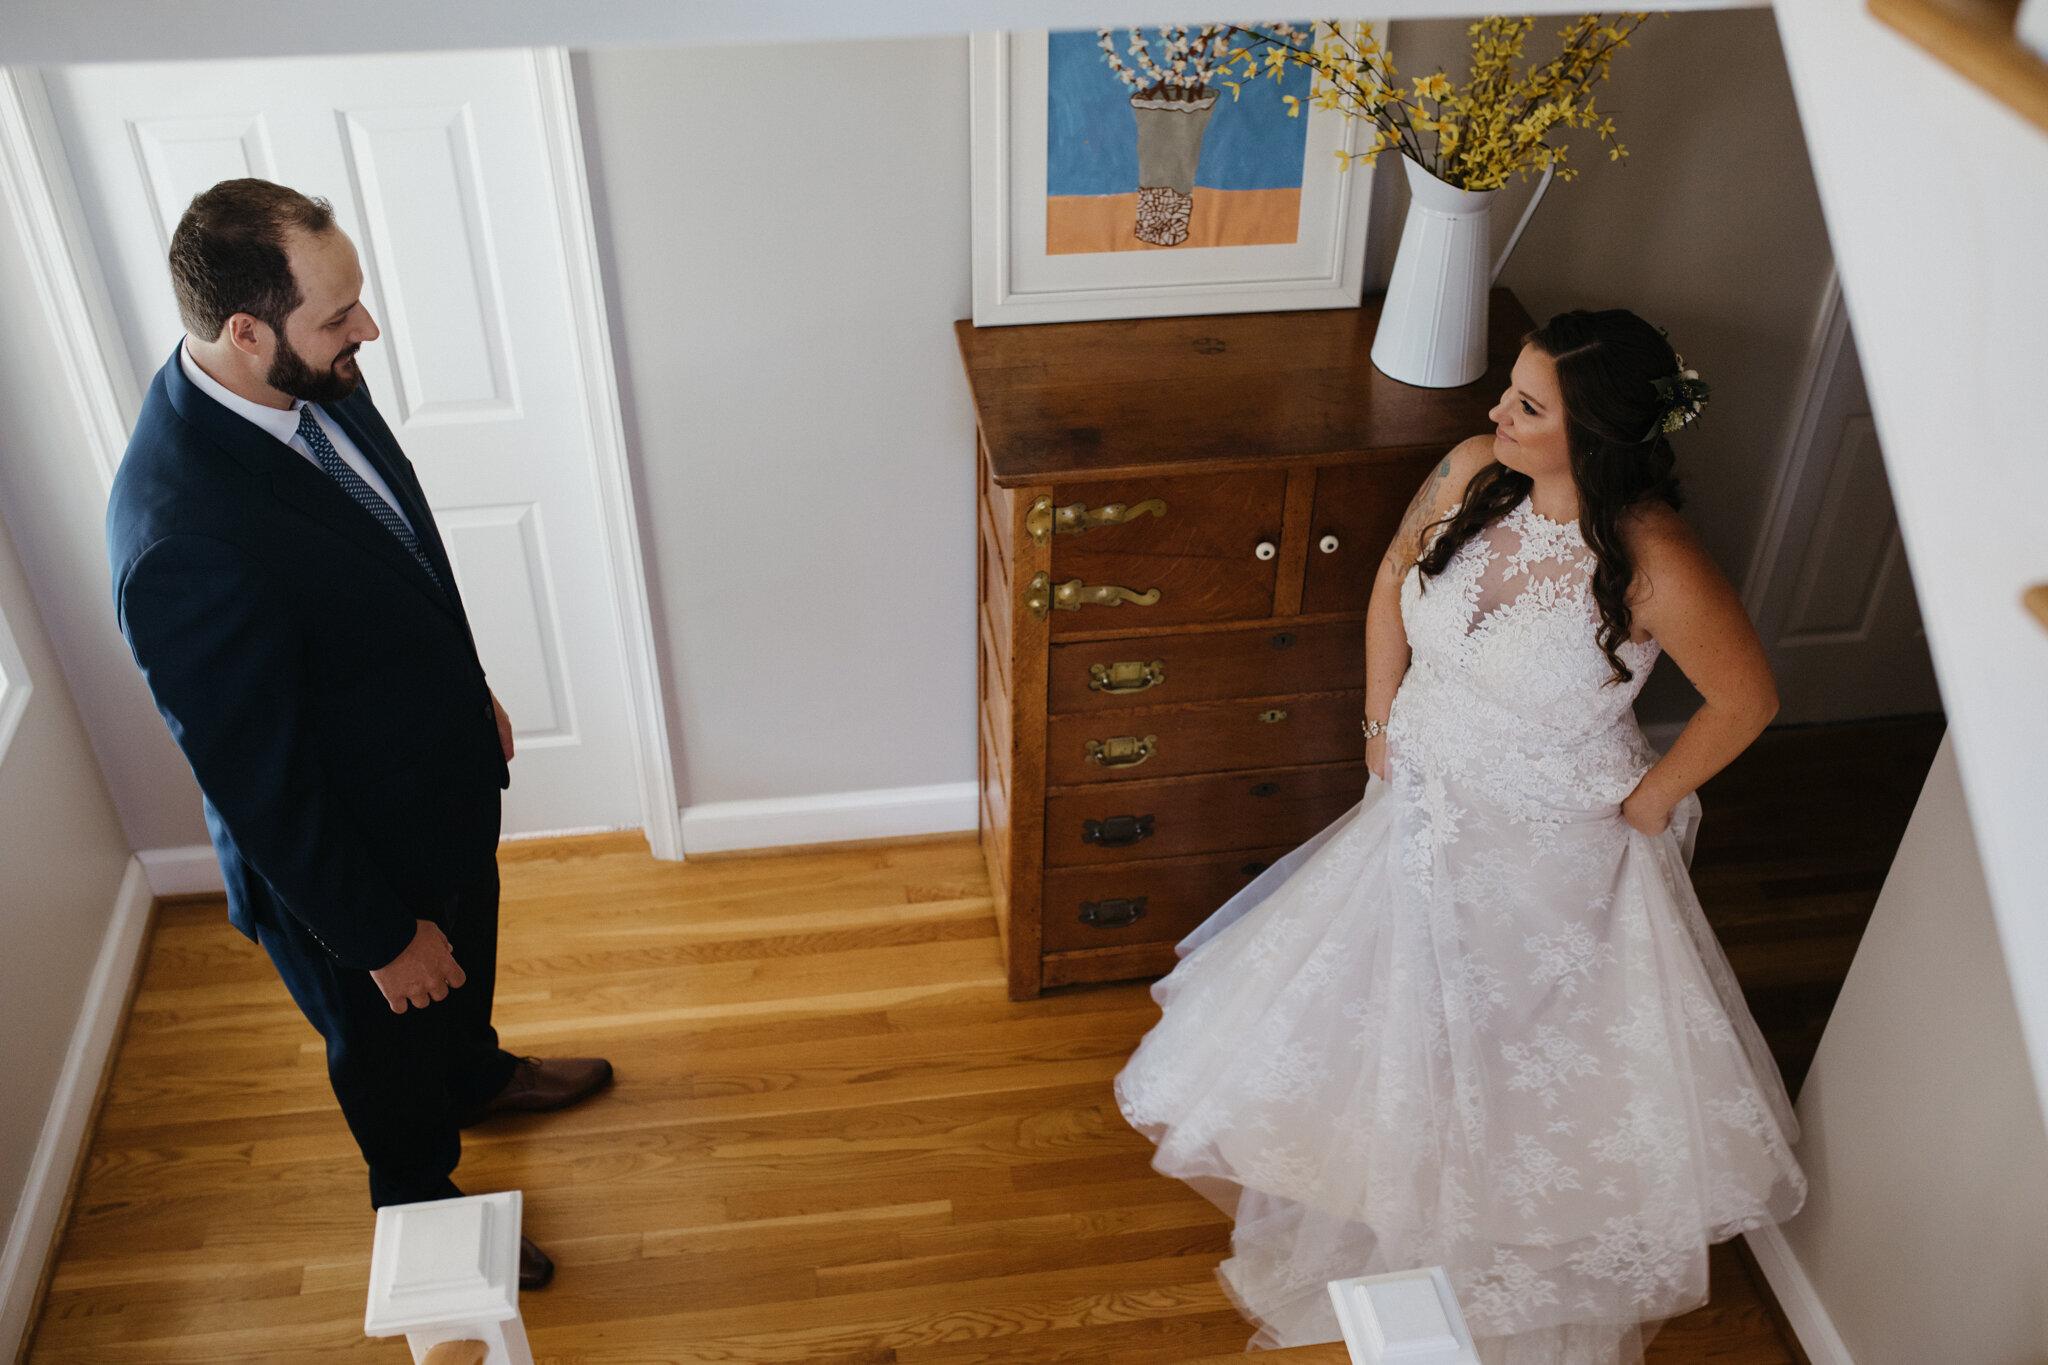 angela_jason_norfolk_wedding-53.jpg